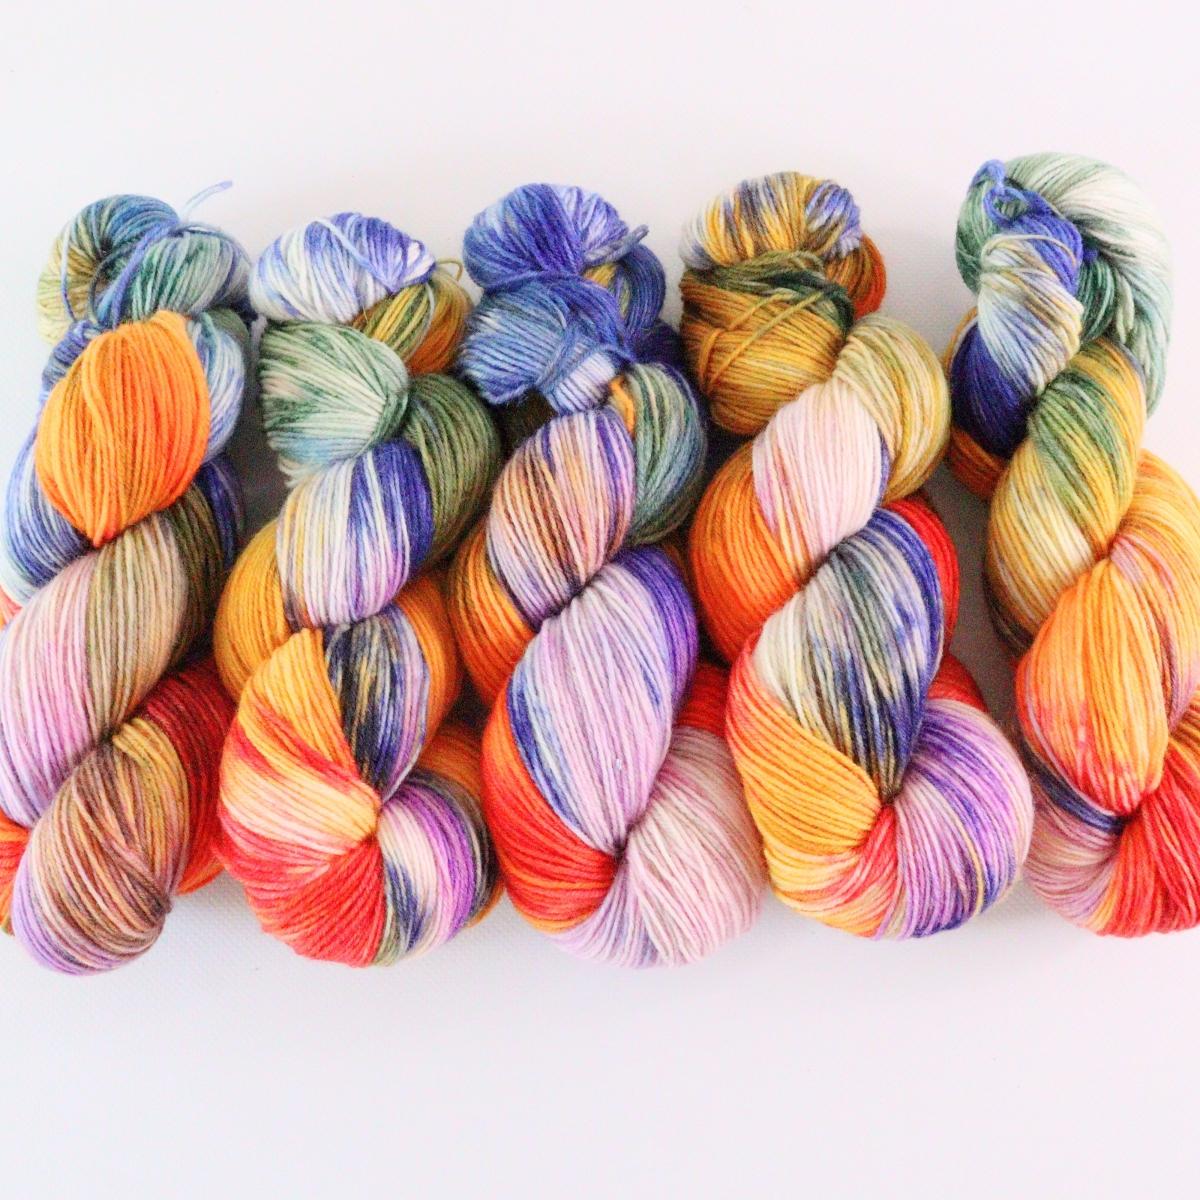 woodico.pro hand dyed yarn 078 5 1200x1200 - Hand dyed yarn / 078